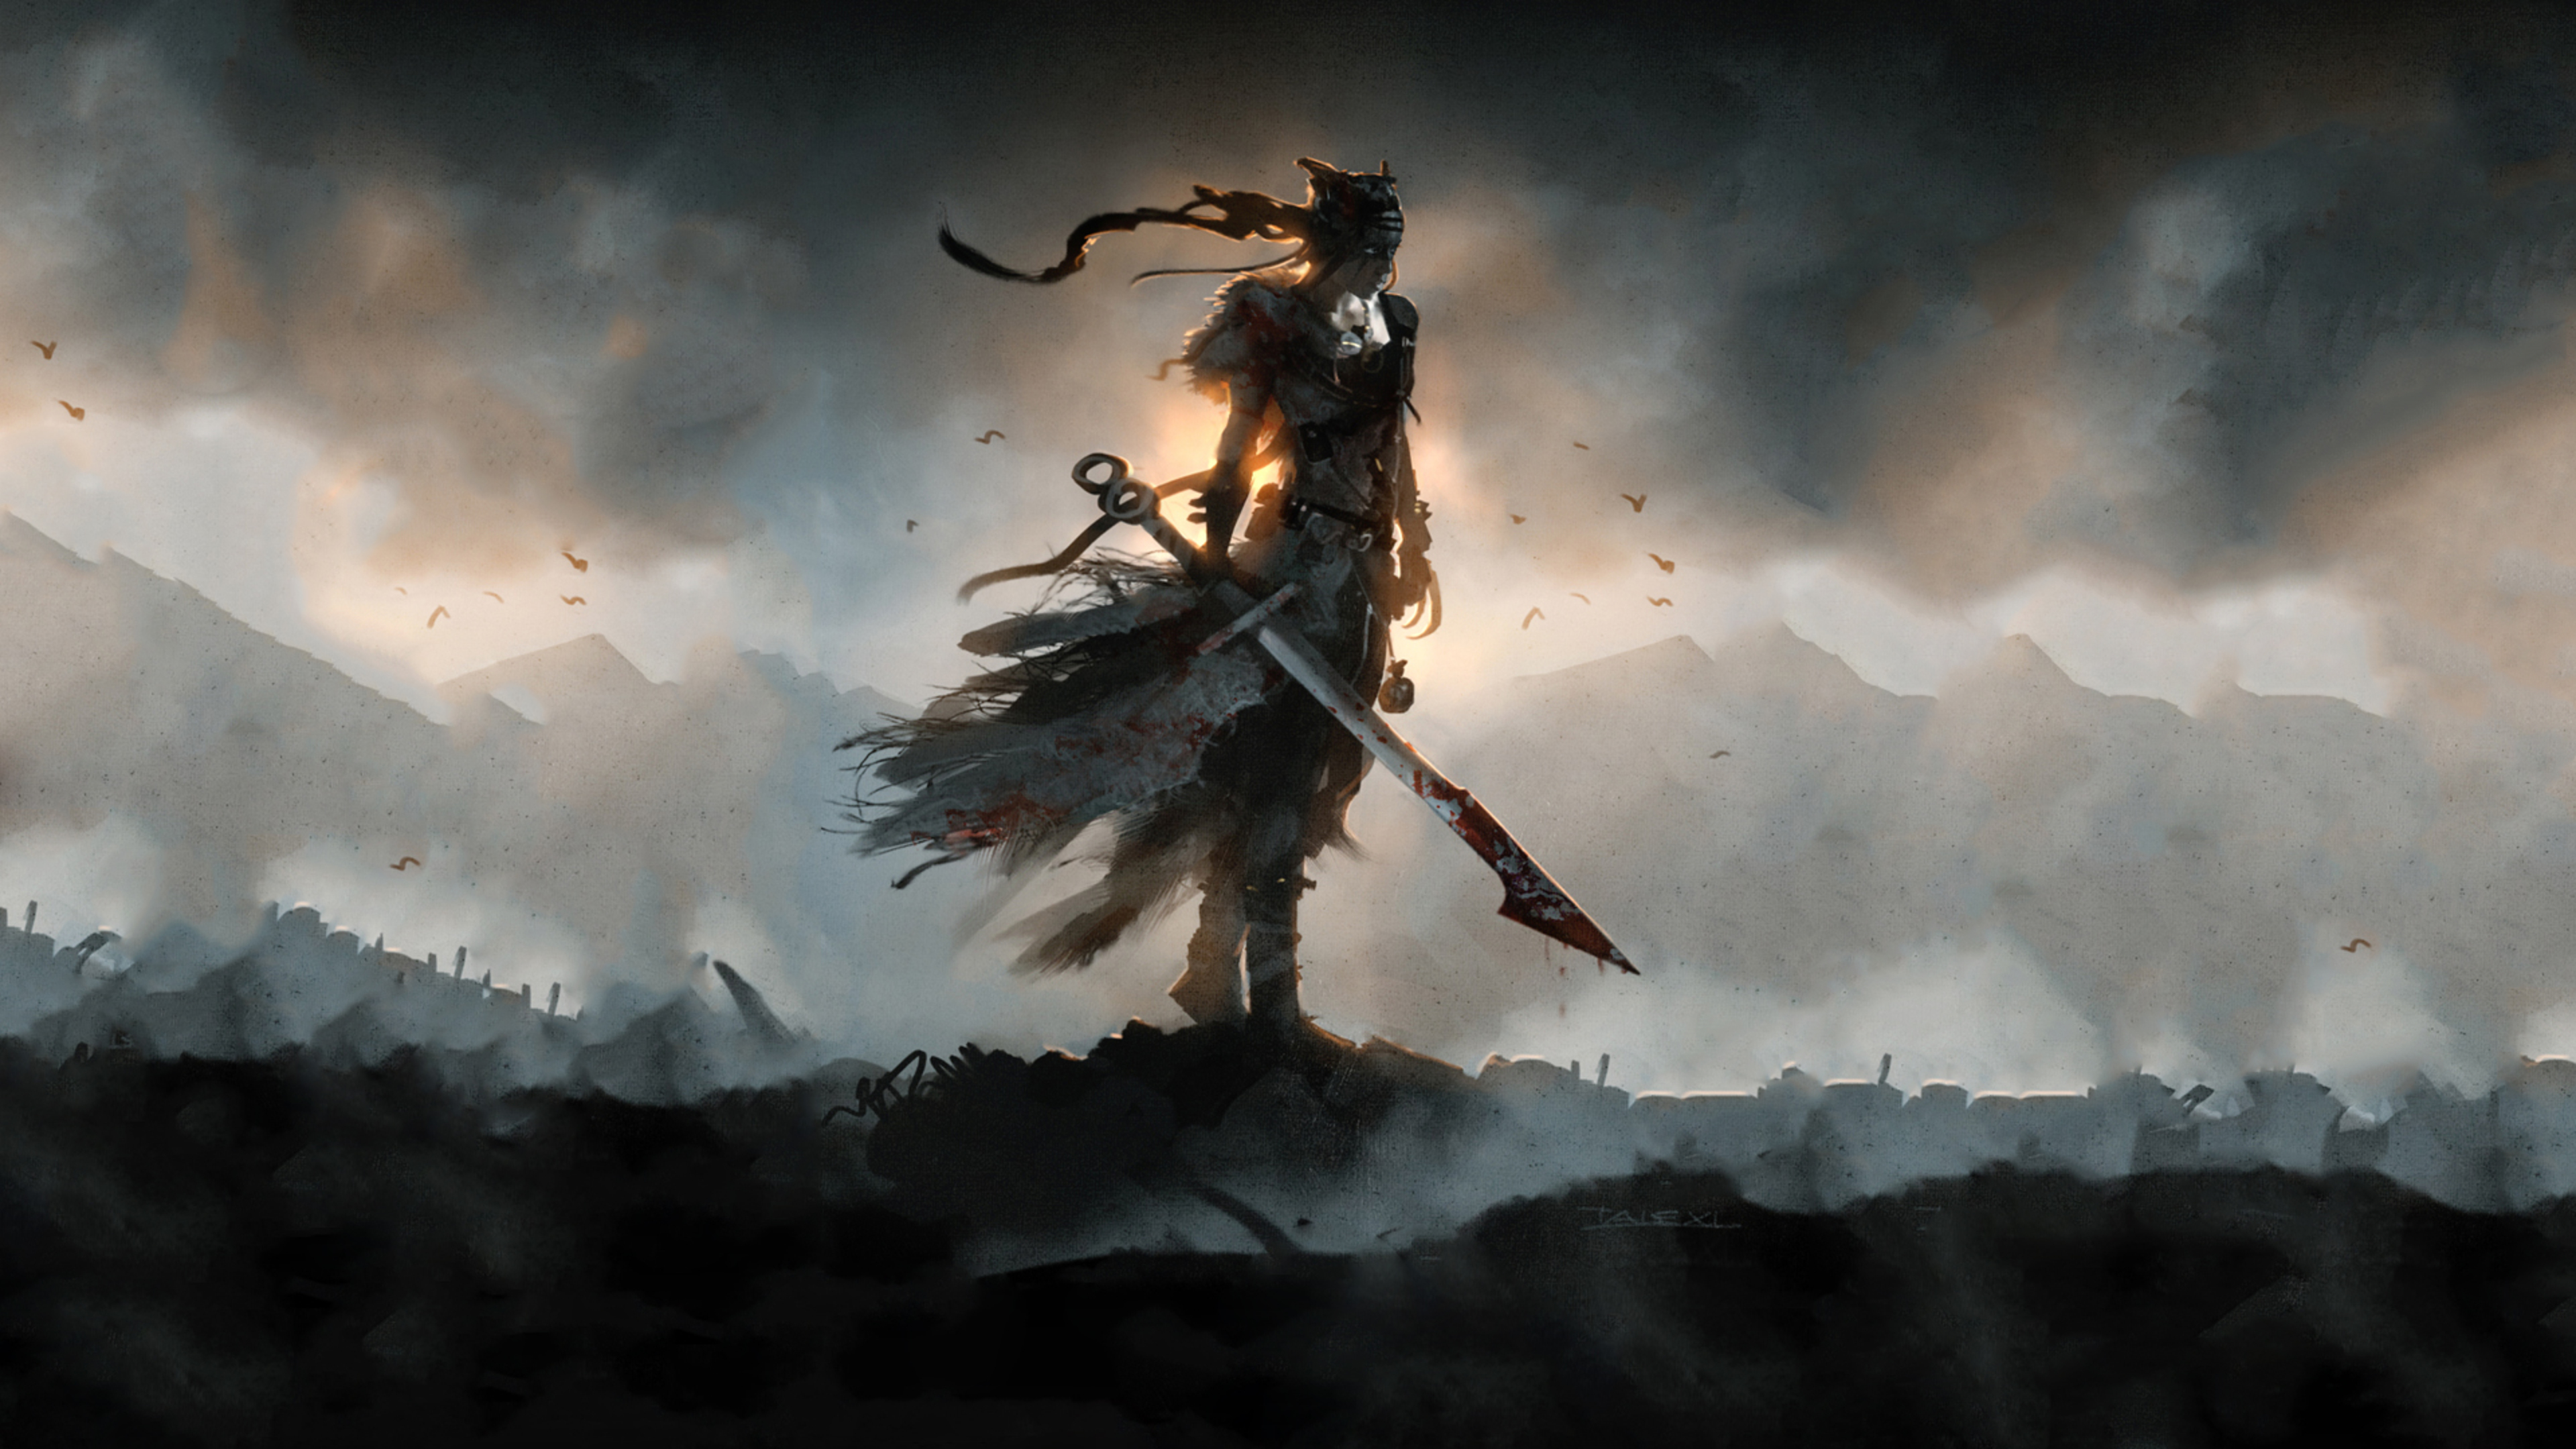 Hellblade senuas жертву. обои скачать